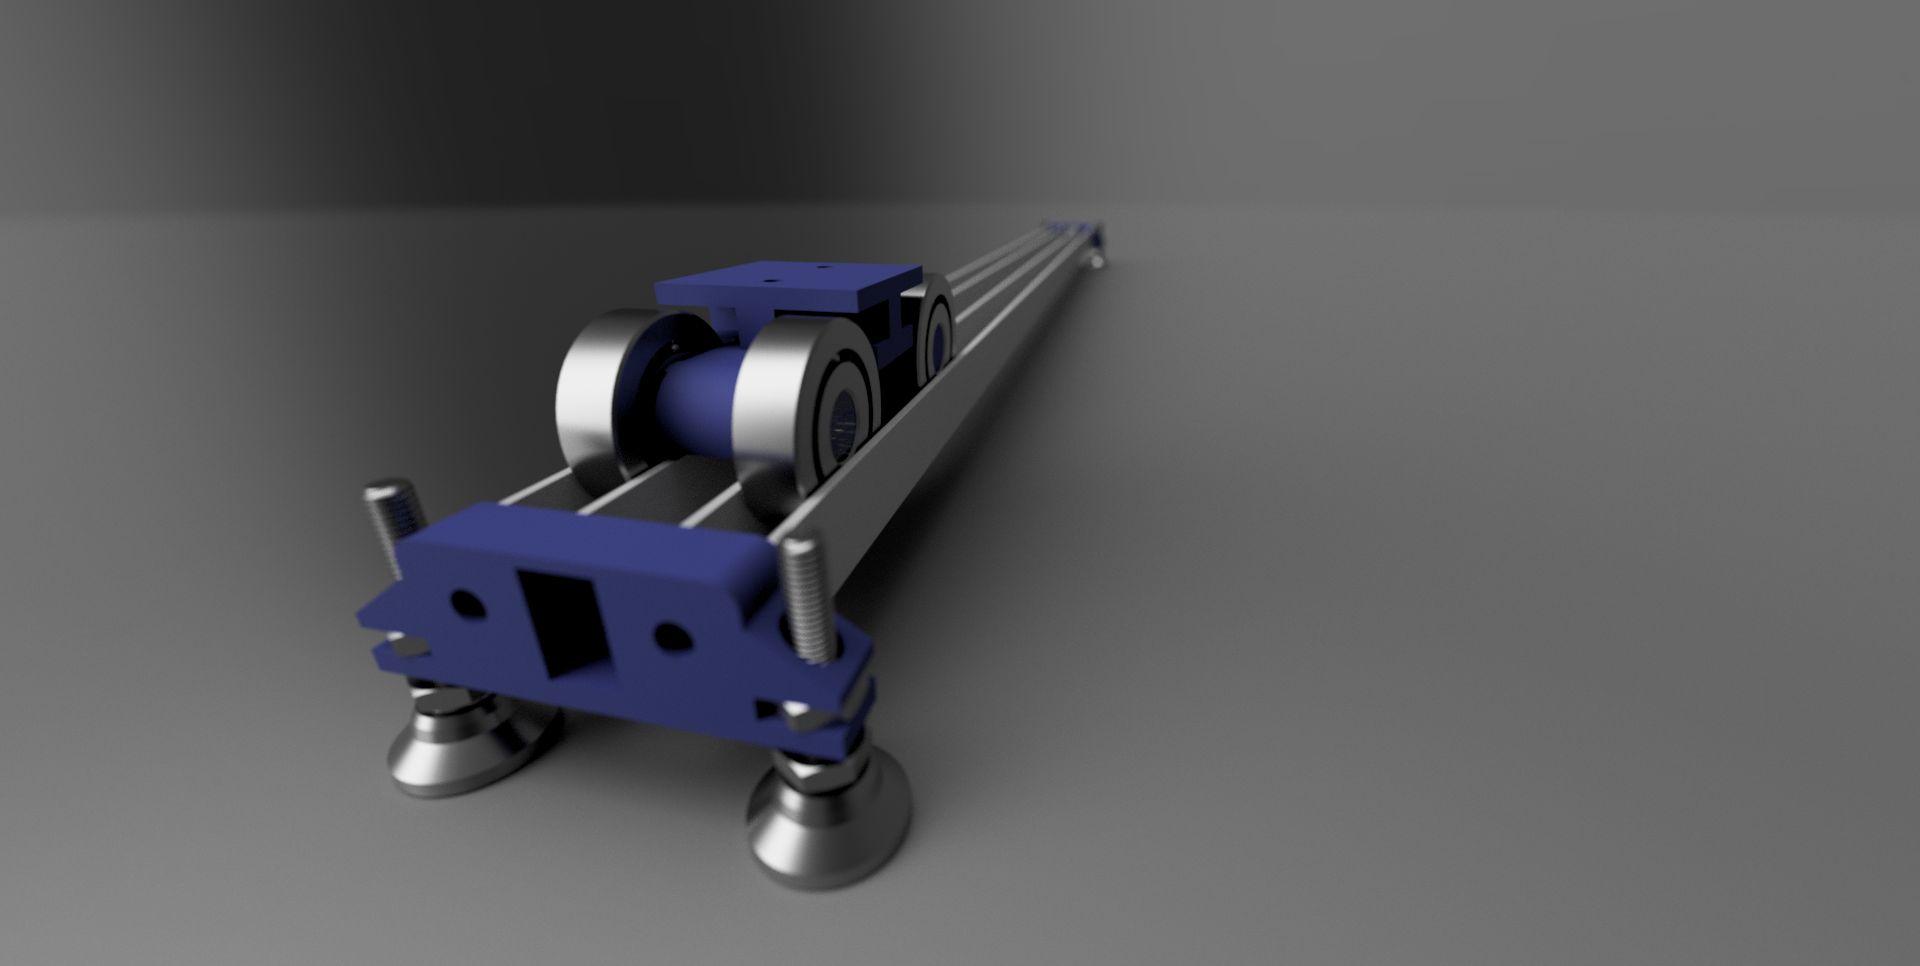 Camera-slide-rail-v7-6-3500-3500